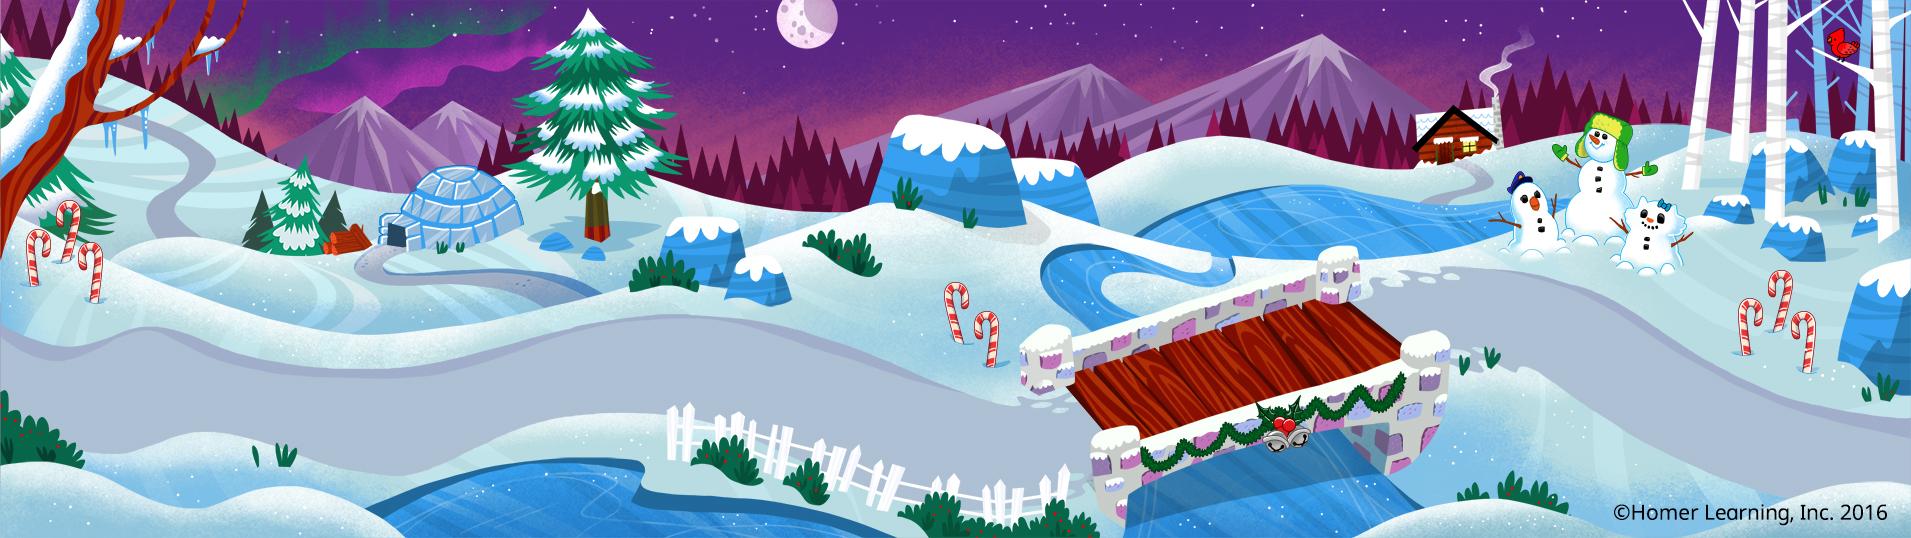 HolidayMap.jpg